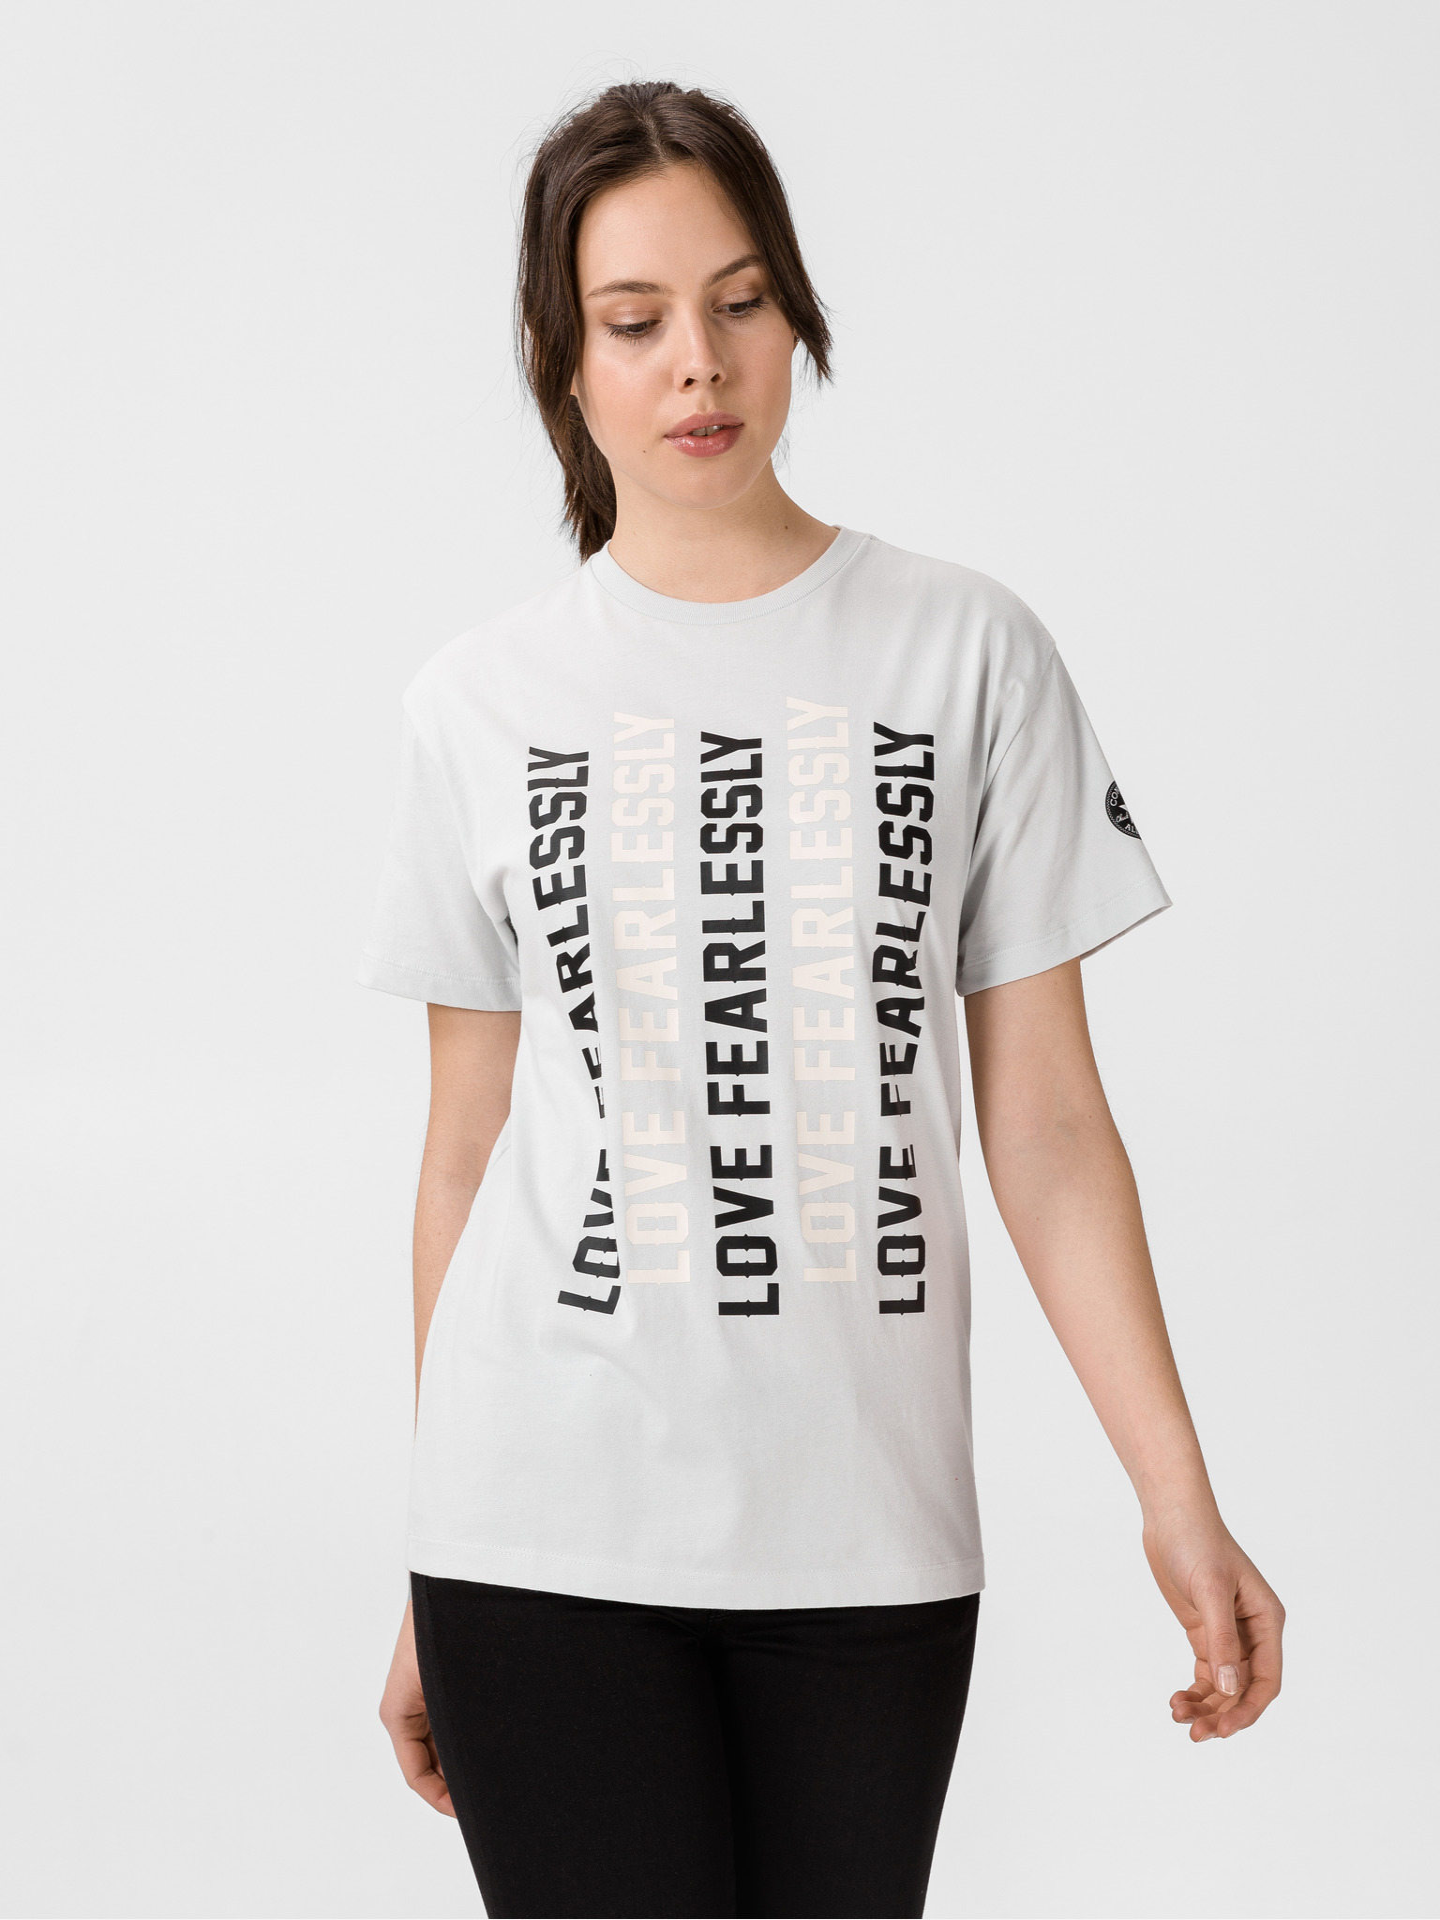 Converse szary damska koszulka Womens Love The Progress 2.0